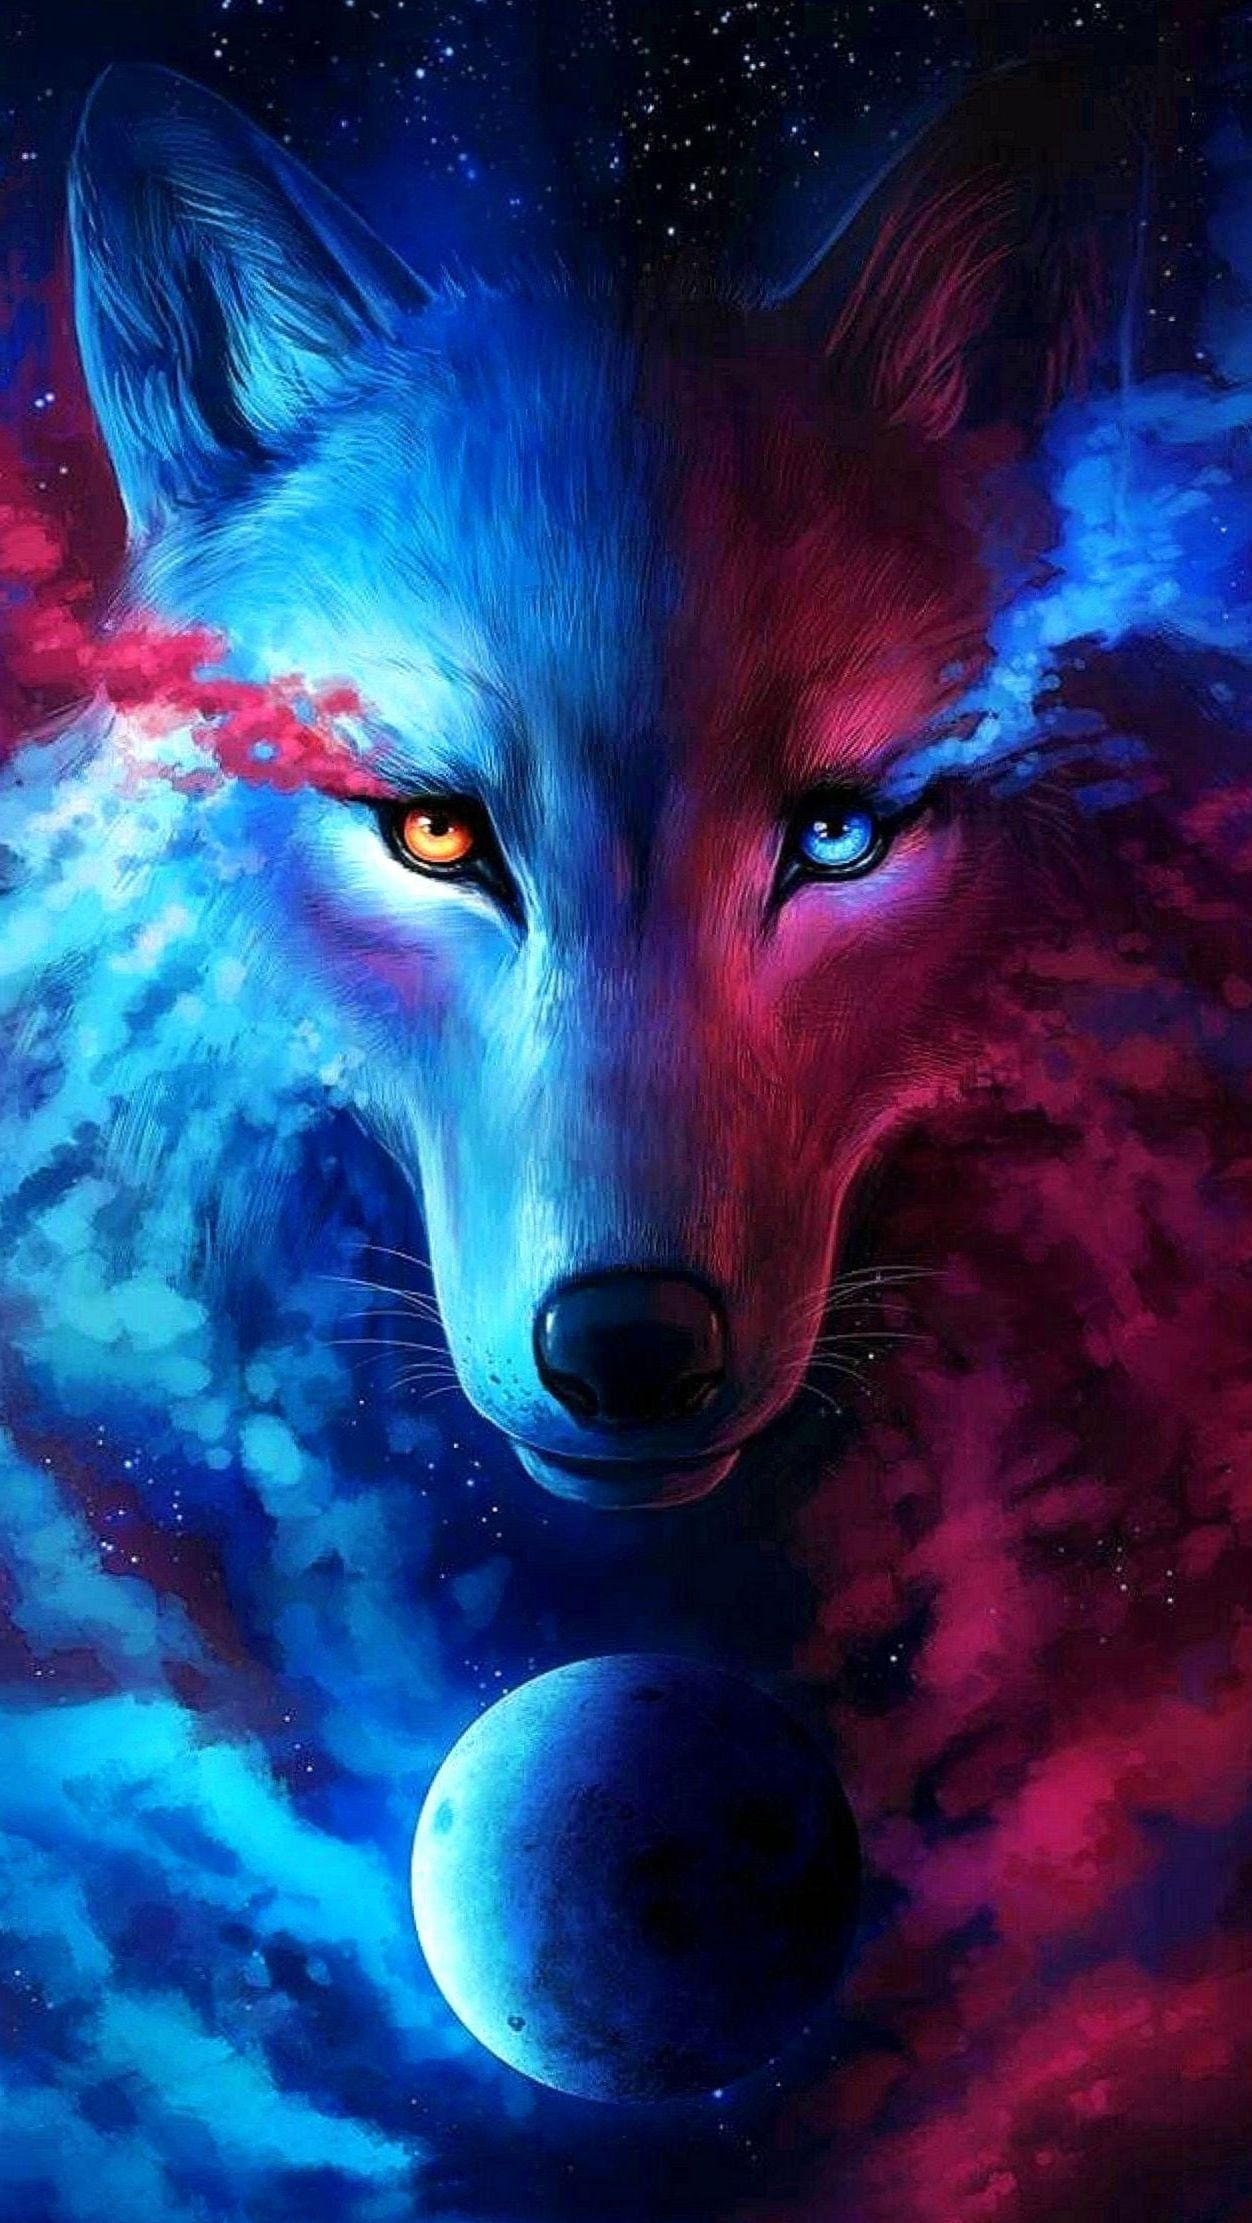 Badass Wolf Wallpapers Badass Wolf Wallpapers Spirit Animal Art Cute Animal Drawings Wolf Spirit Animal